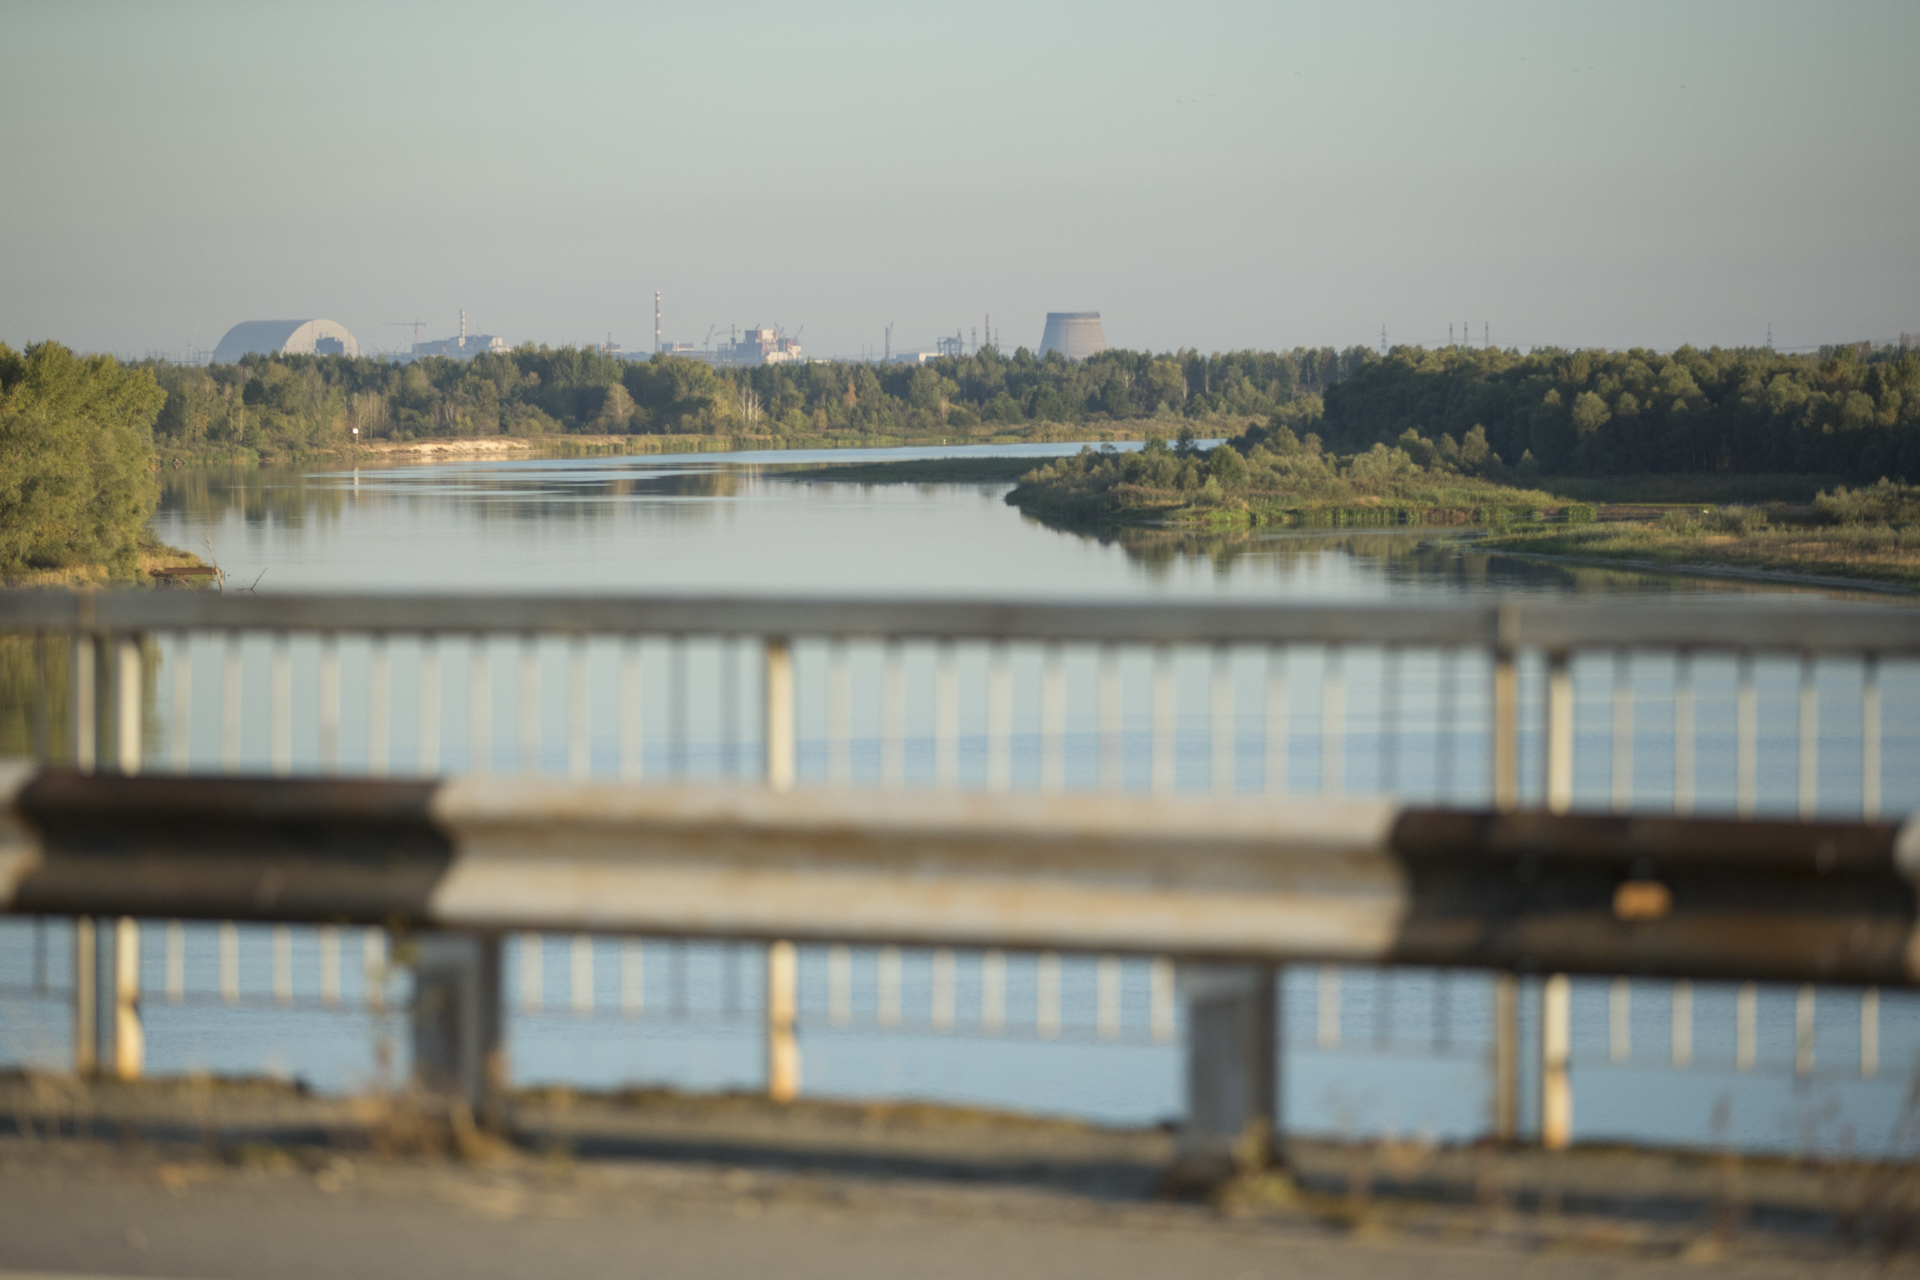 Chernobyl's exclusion zone spans 2600 square kilometres.